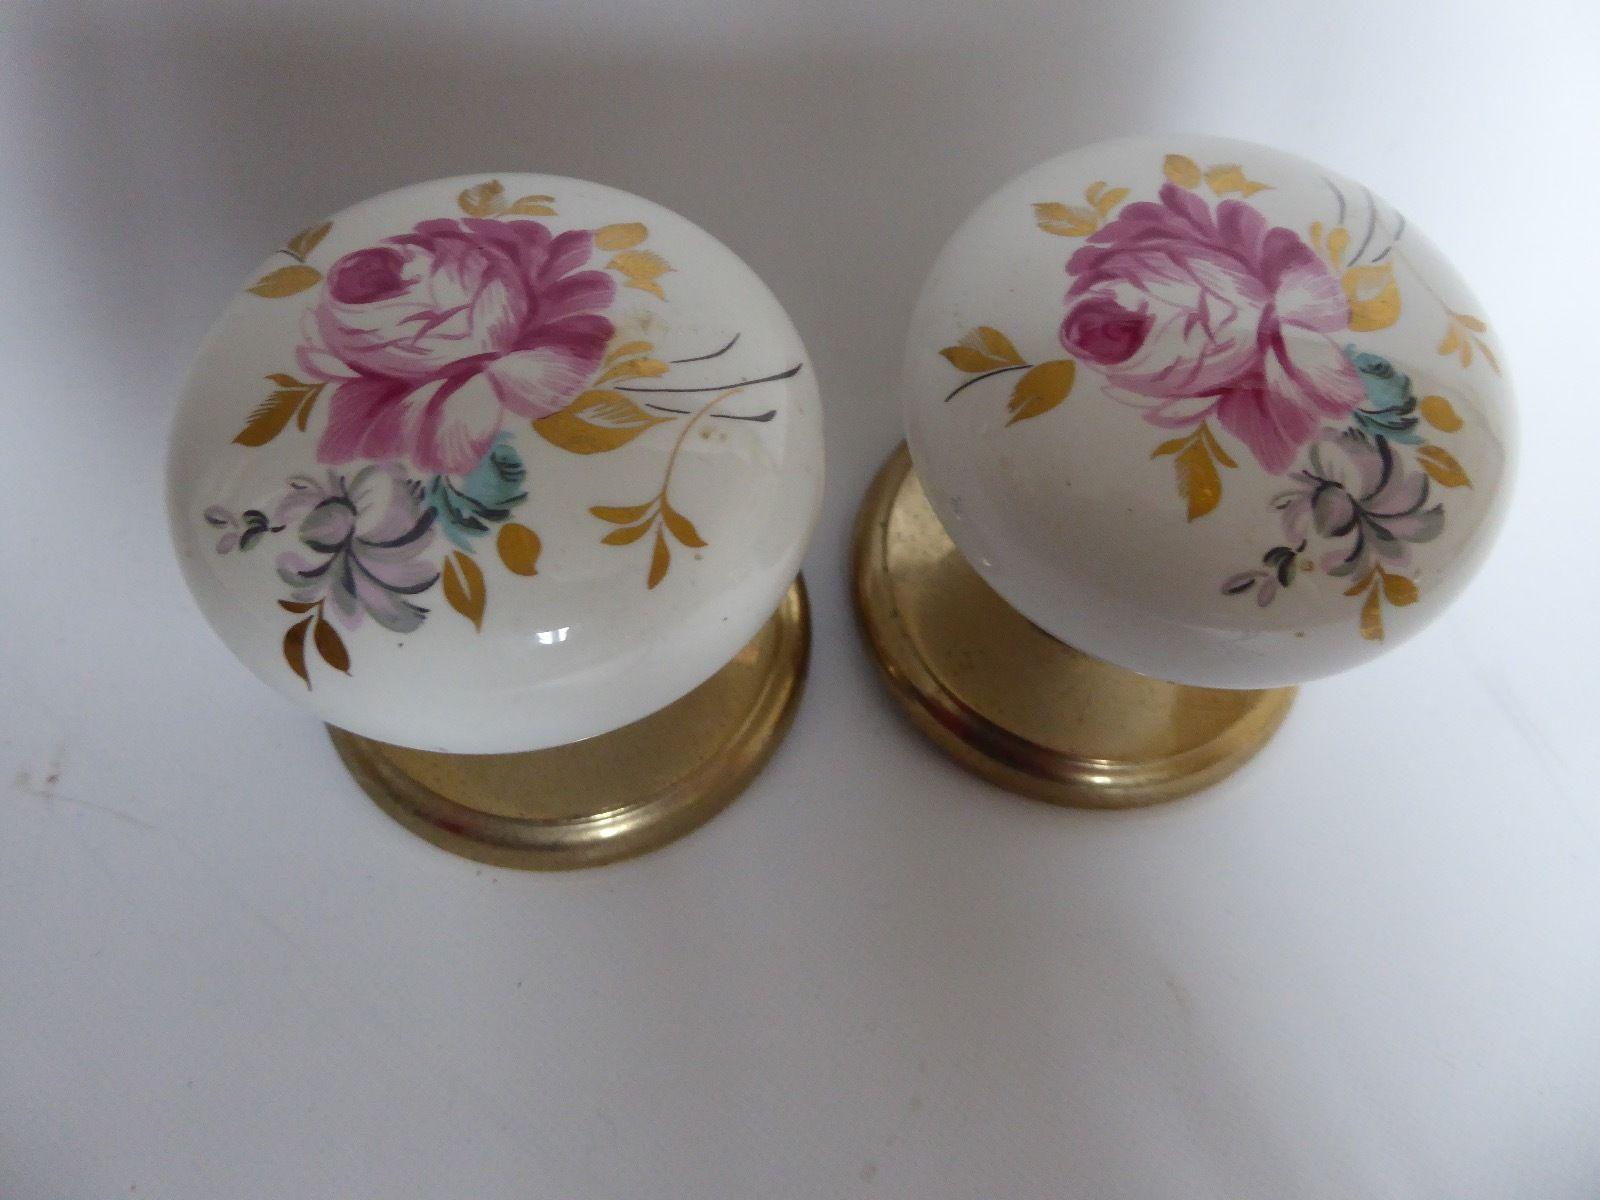 gainsborough porcelain door knobs photo - 7